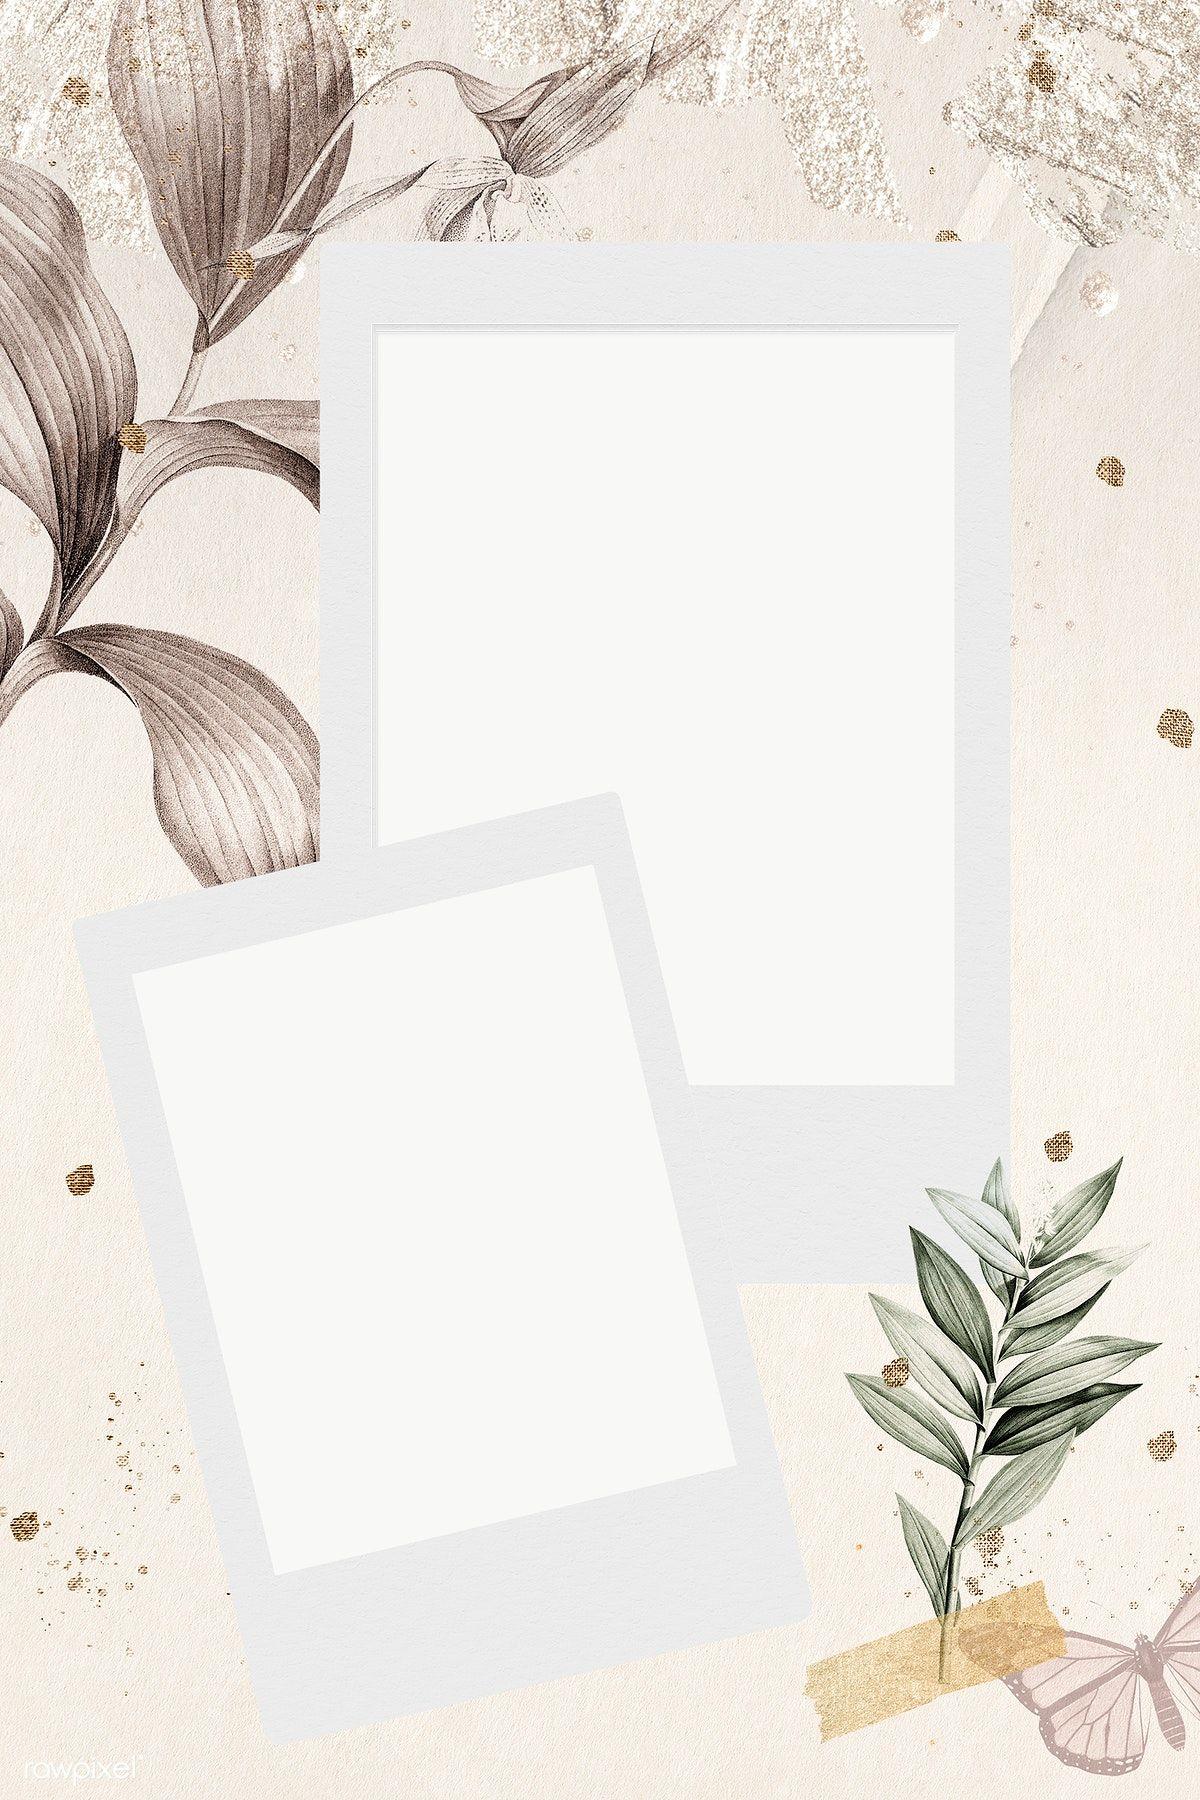 Blank Photo Frames On Tropical Leafy Background Transparent Png Premium Image By Rawpixel Com Adj Ilustrasi Poster Ilustrasi Kertas Dinding